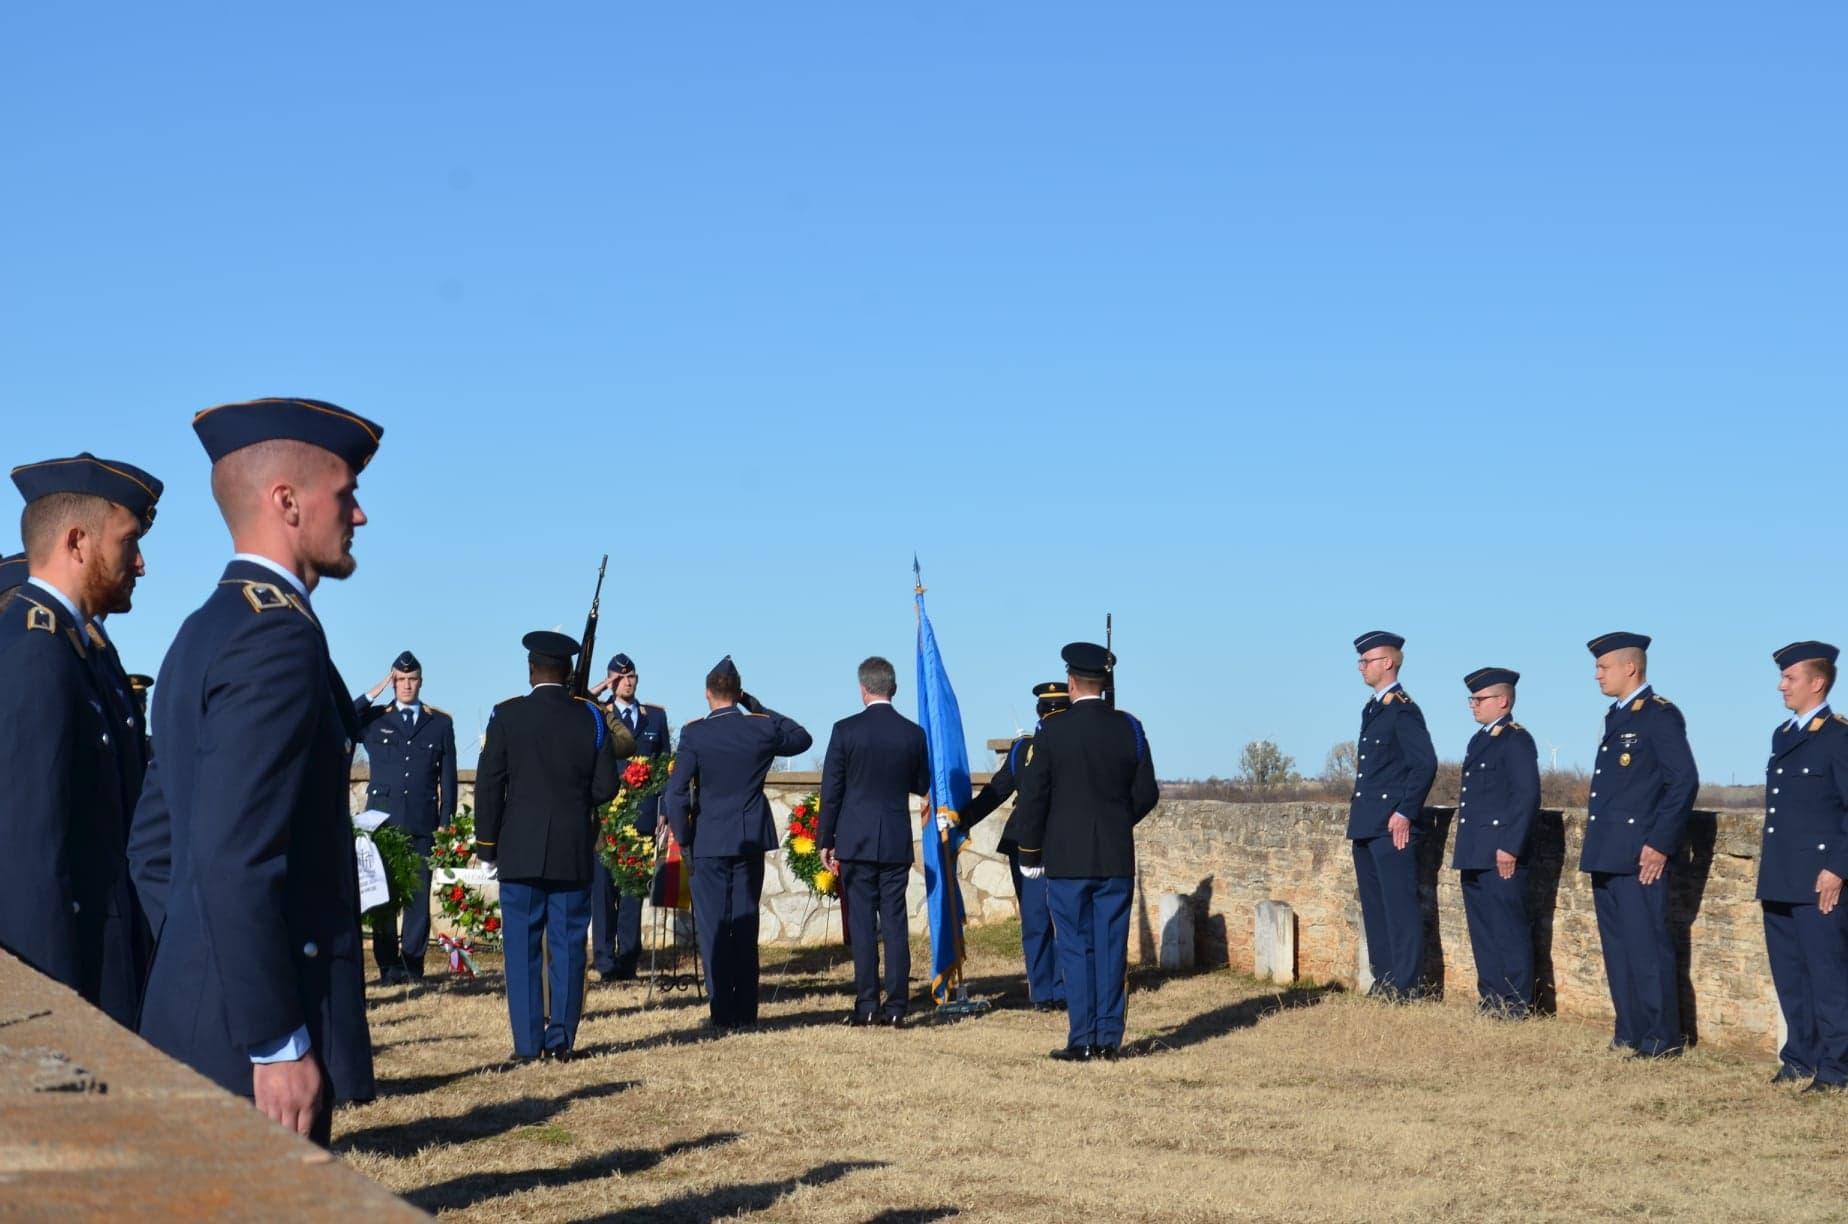 POW Cemetery Fort Reno Salute